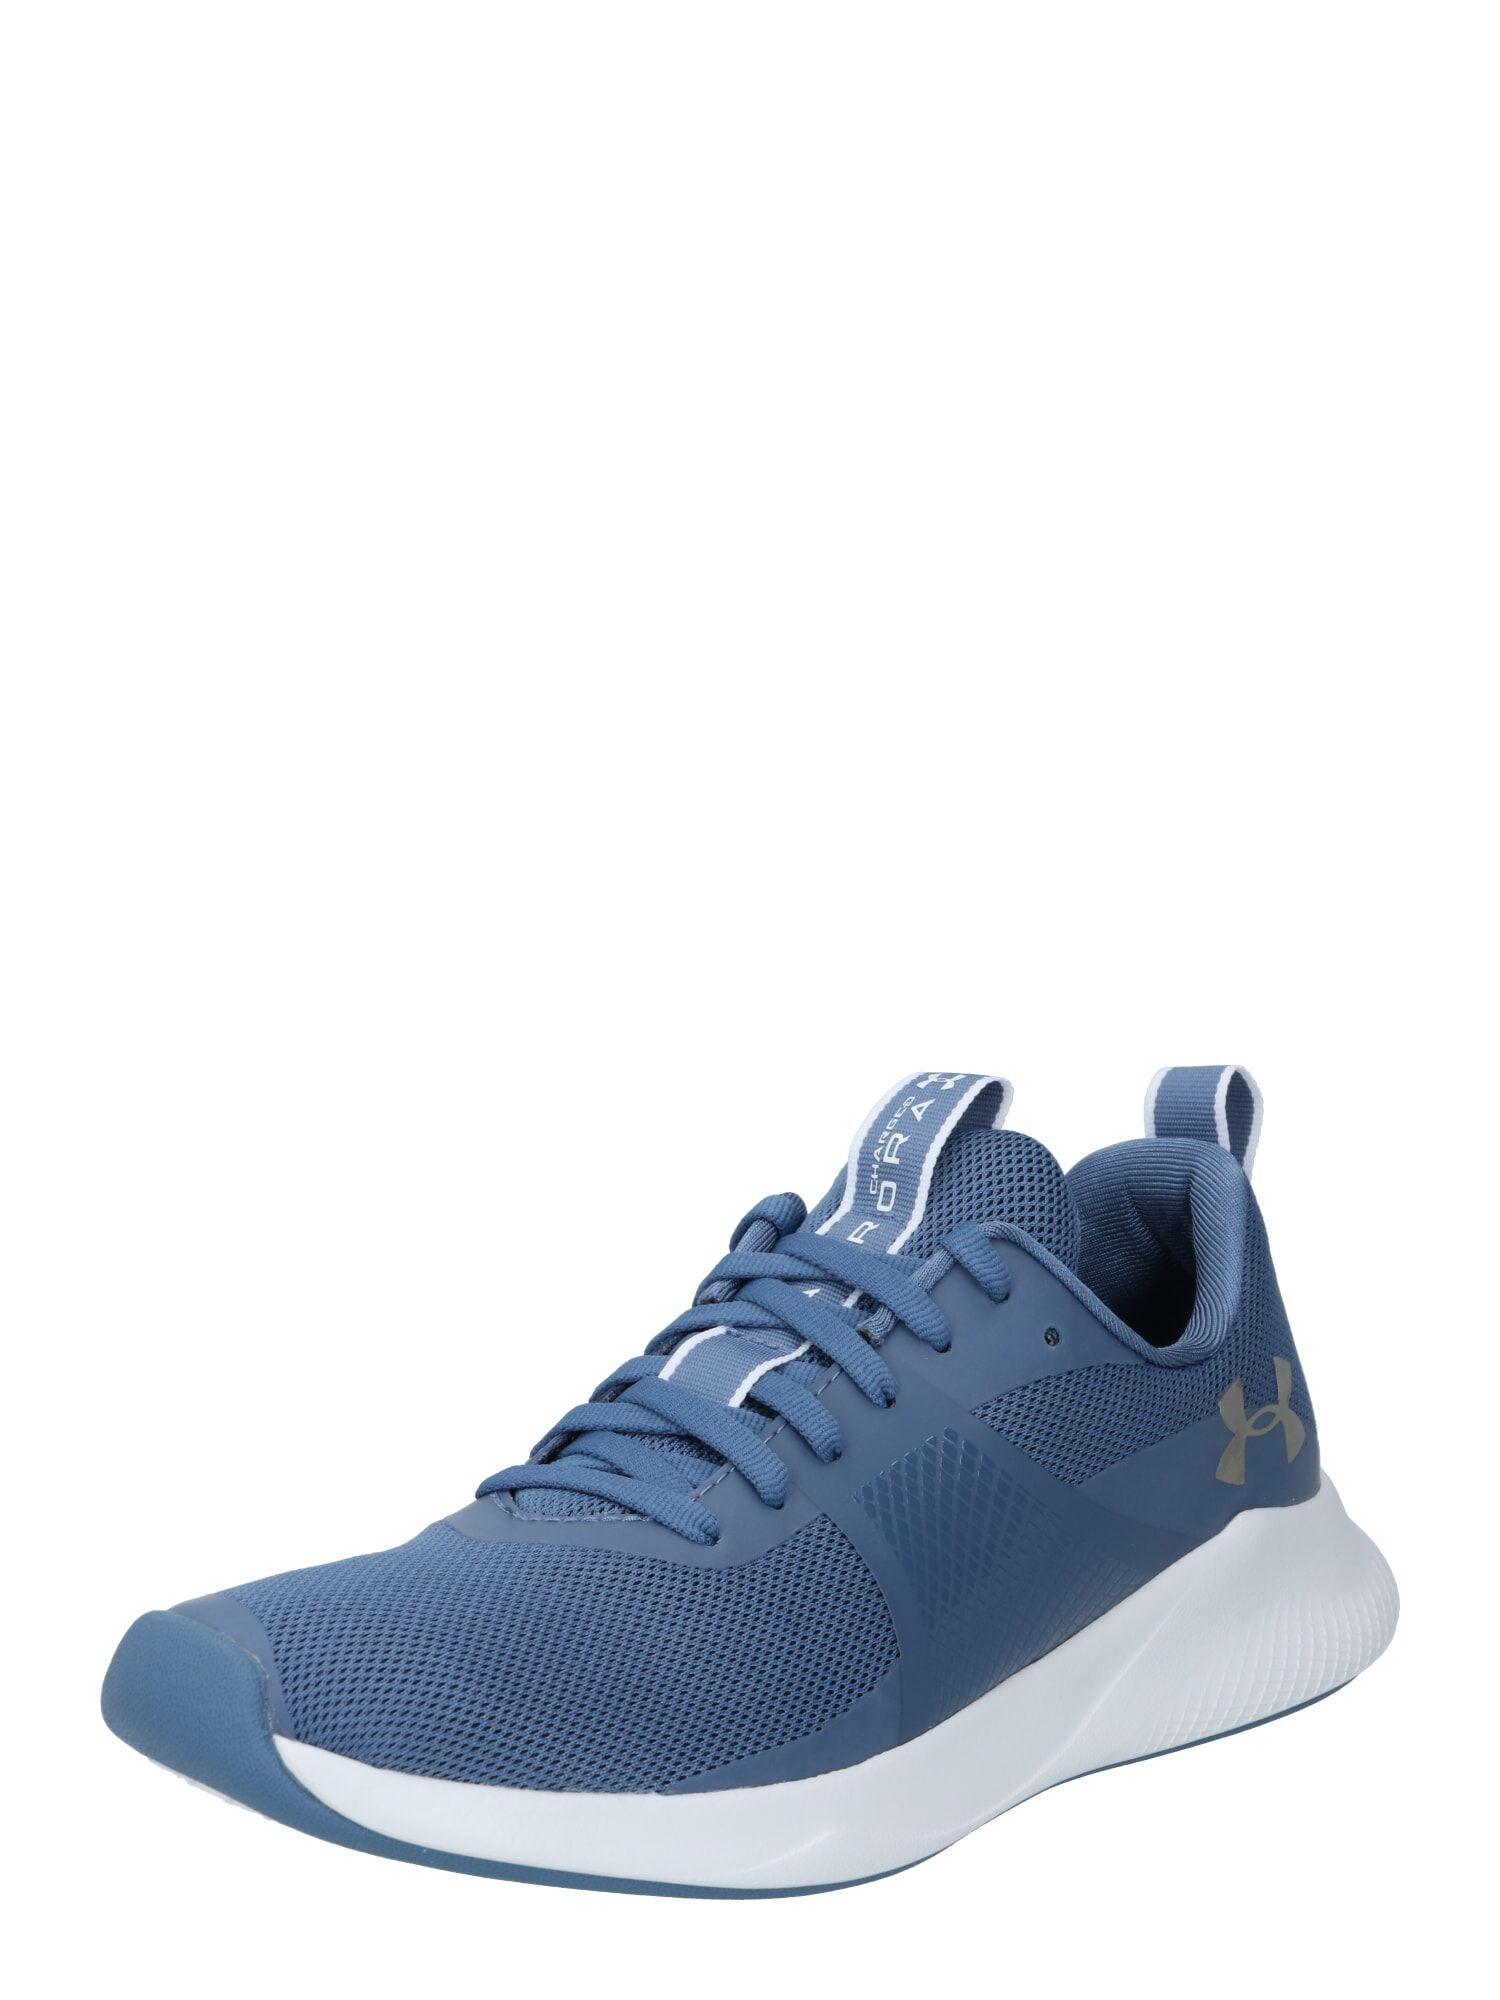 UNDER ARMOUR Chaussure de sport 'Aurora'  - Bleu - Taille: 6.5 - female